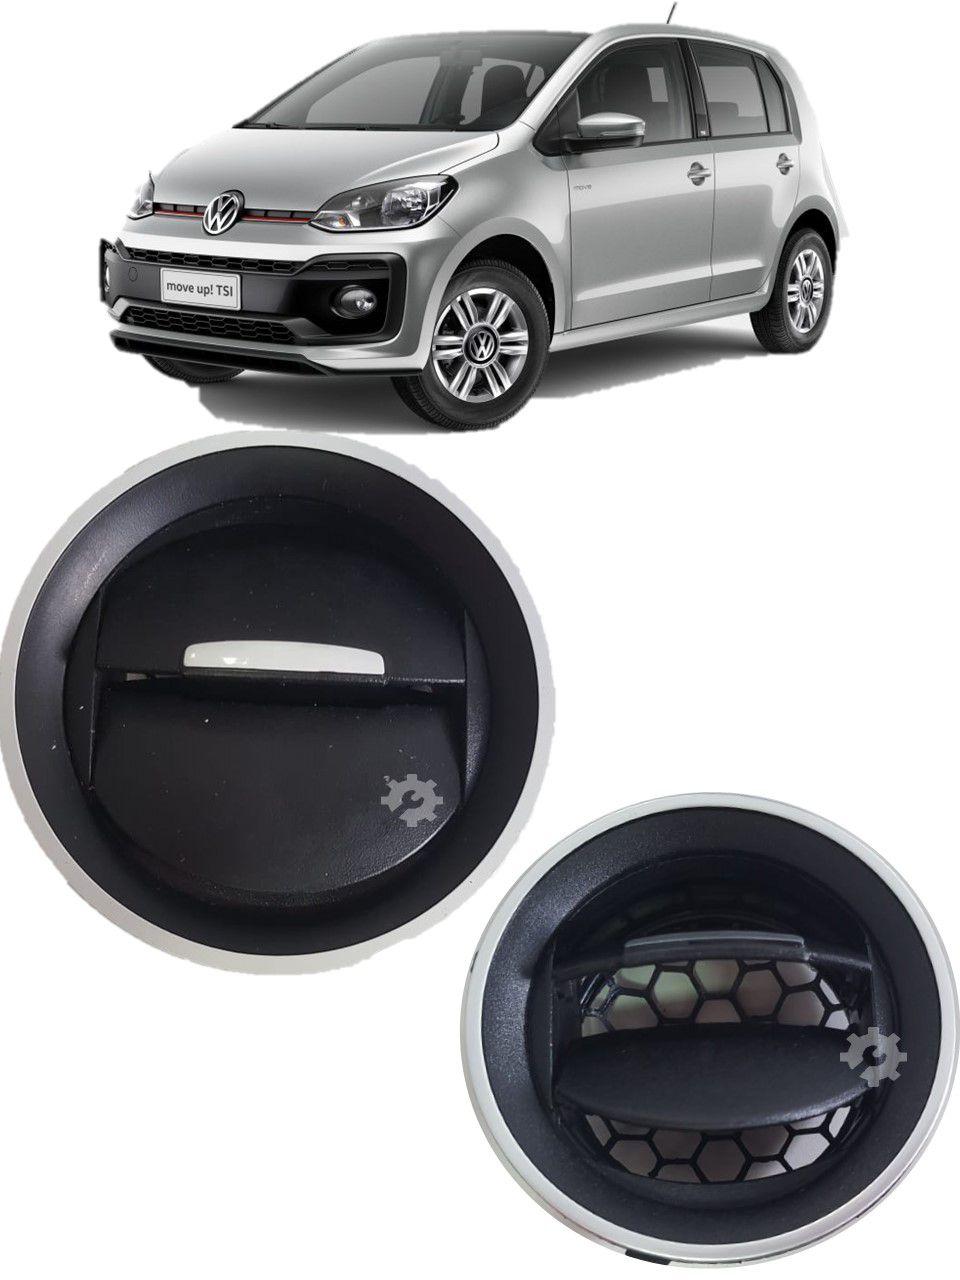 Difusor Ar Prata Volkswagen Up 2014 2015 2017 2019